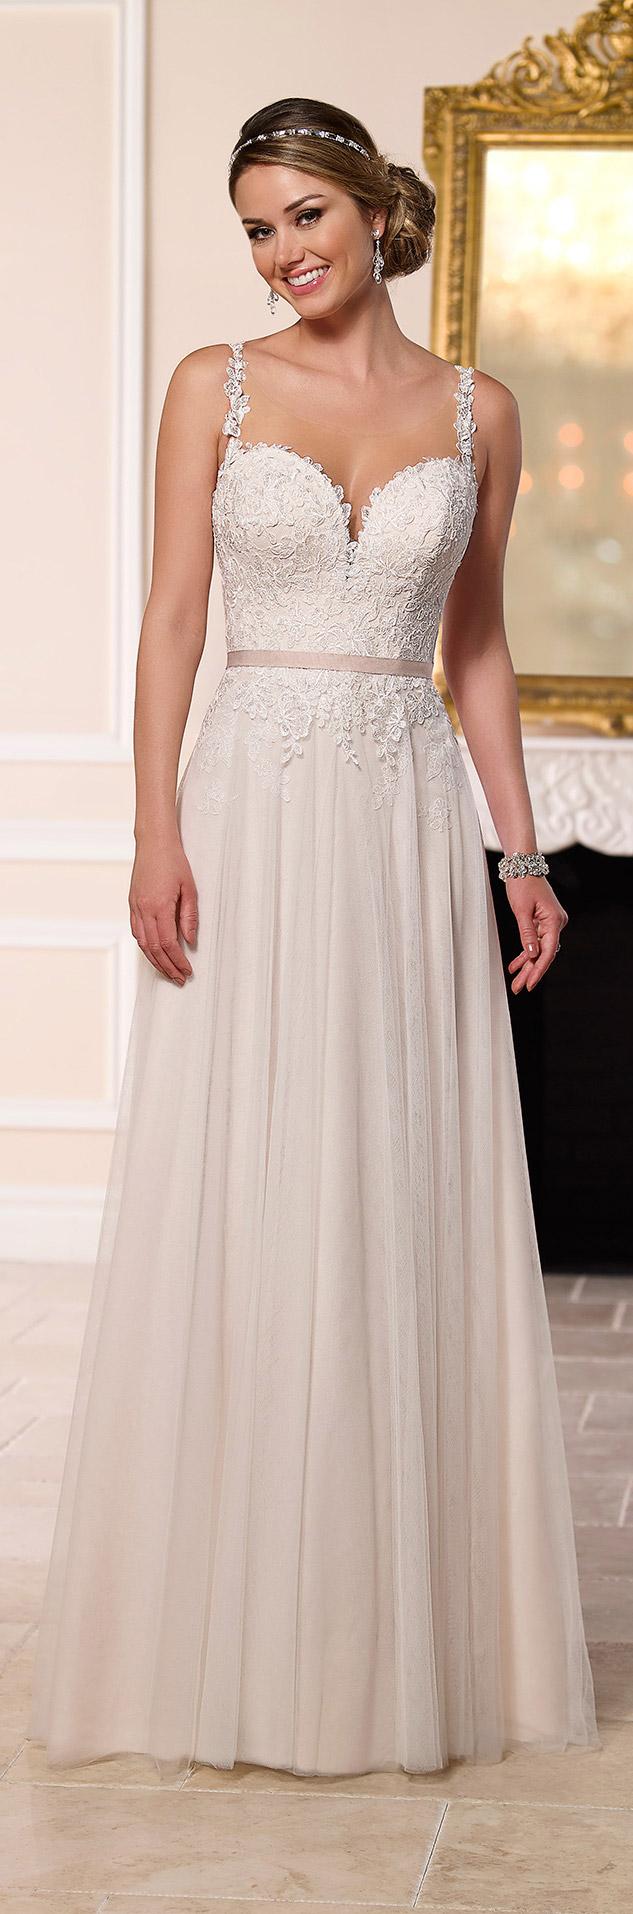 Stella york long aline wedding dress more wedding dreams